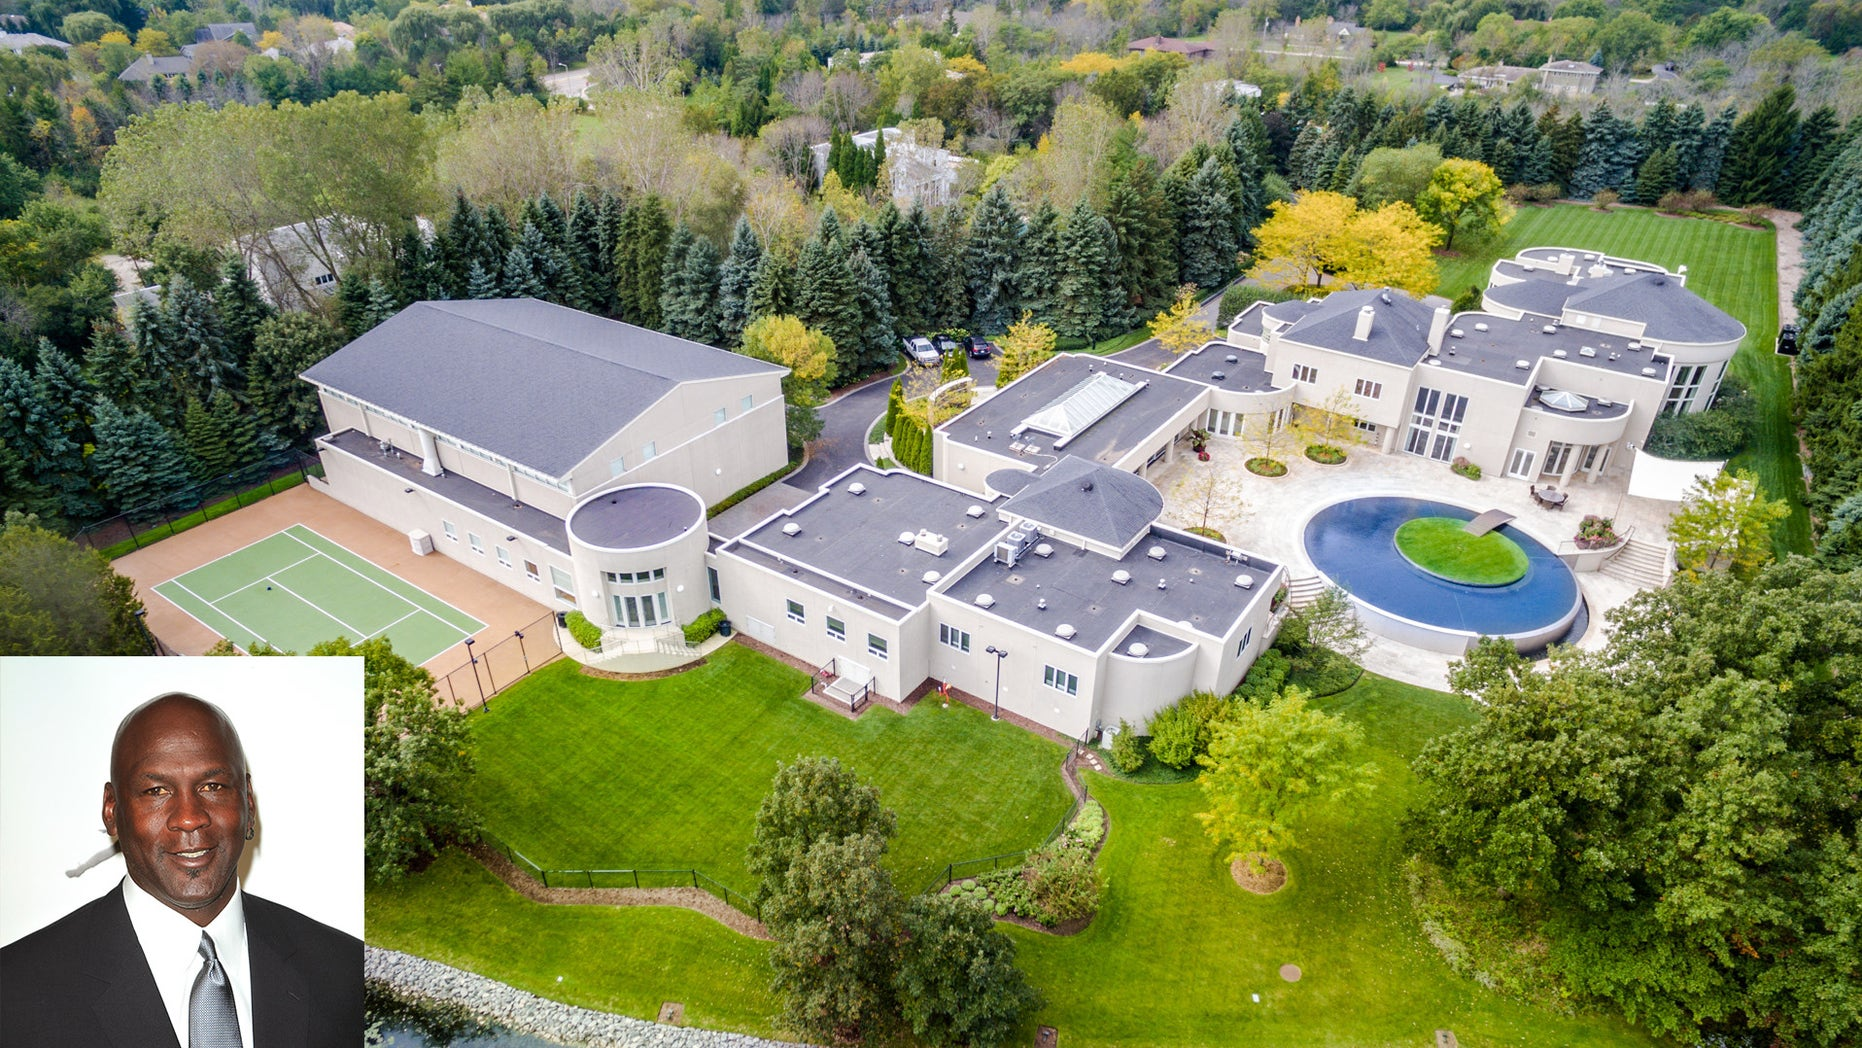 Michael Jordan's home near Chicago